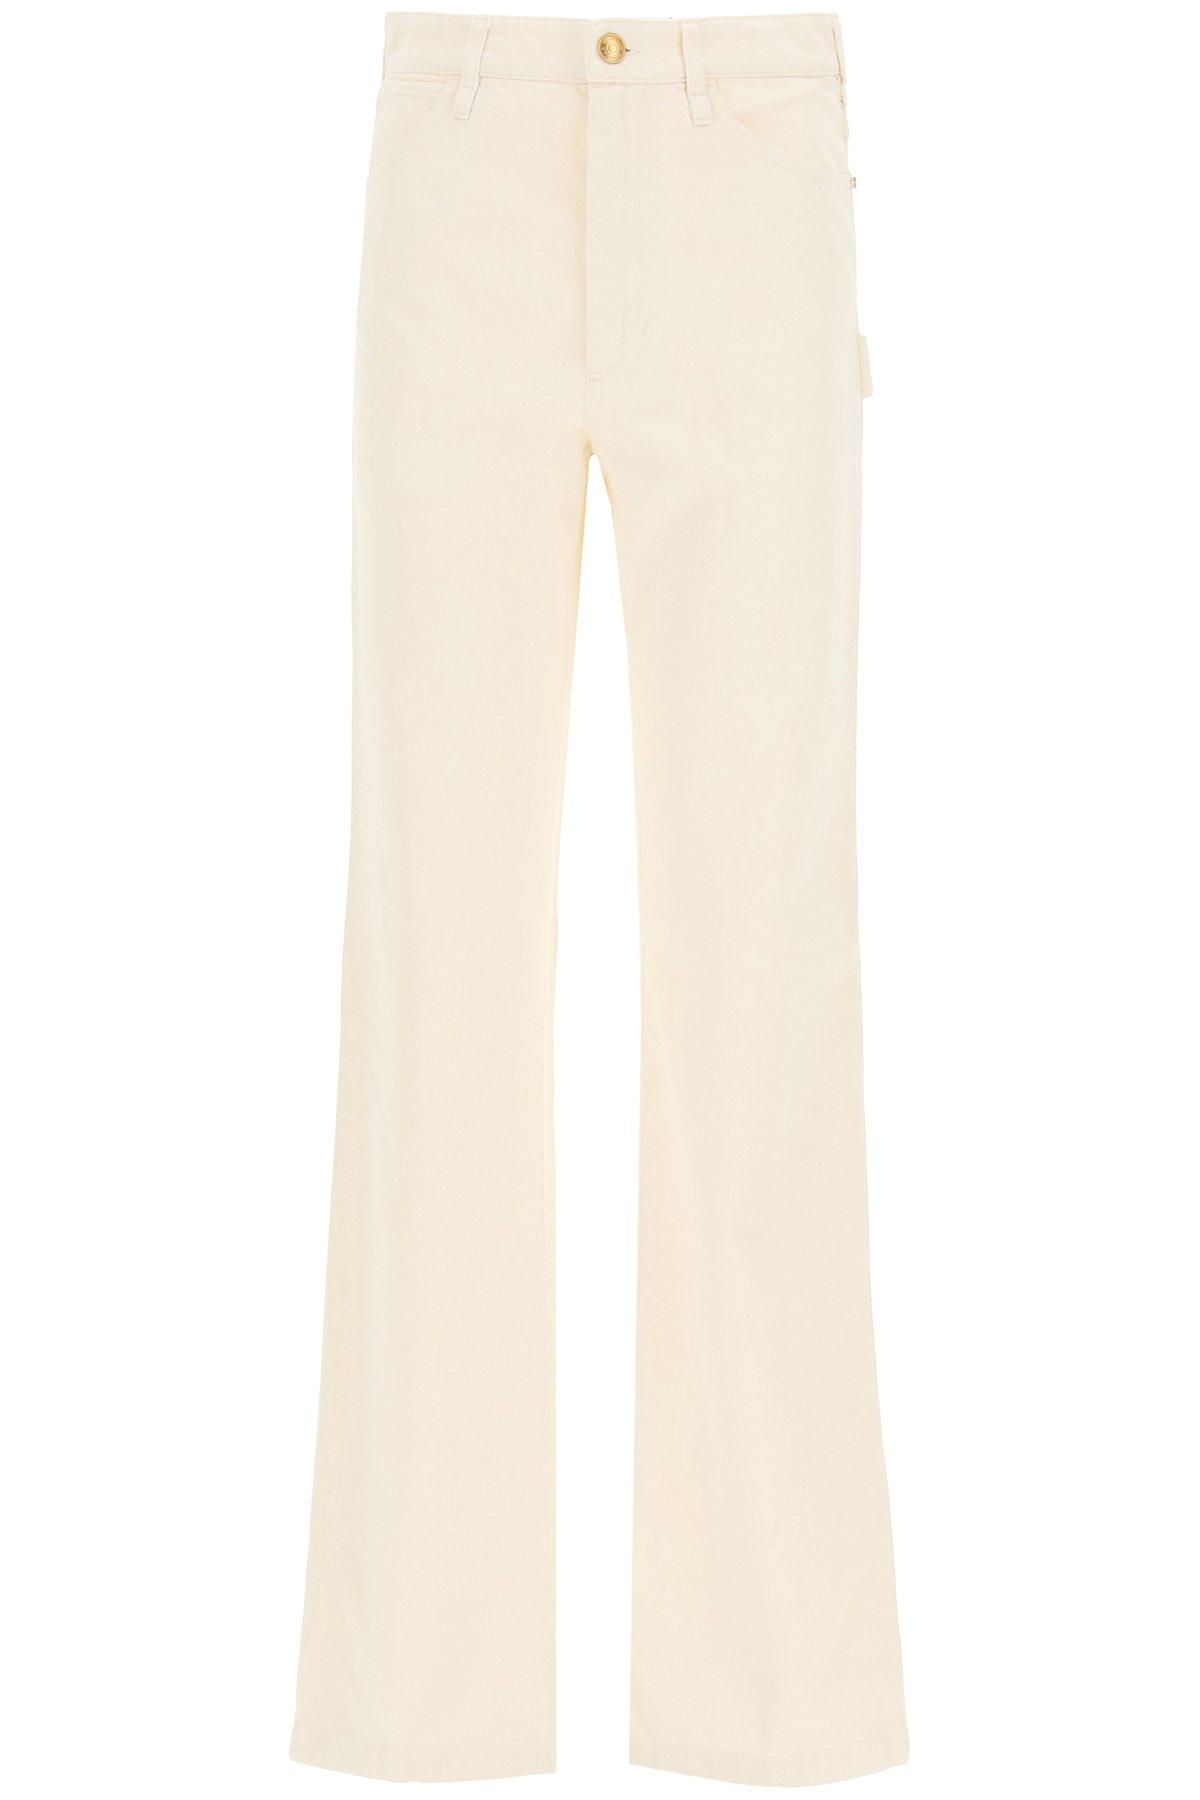 Sportmax jeans palazzo